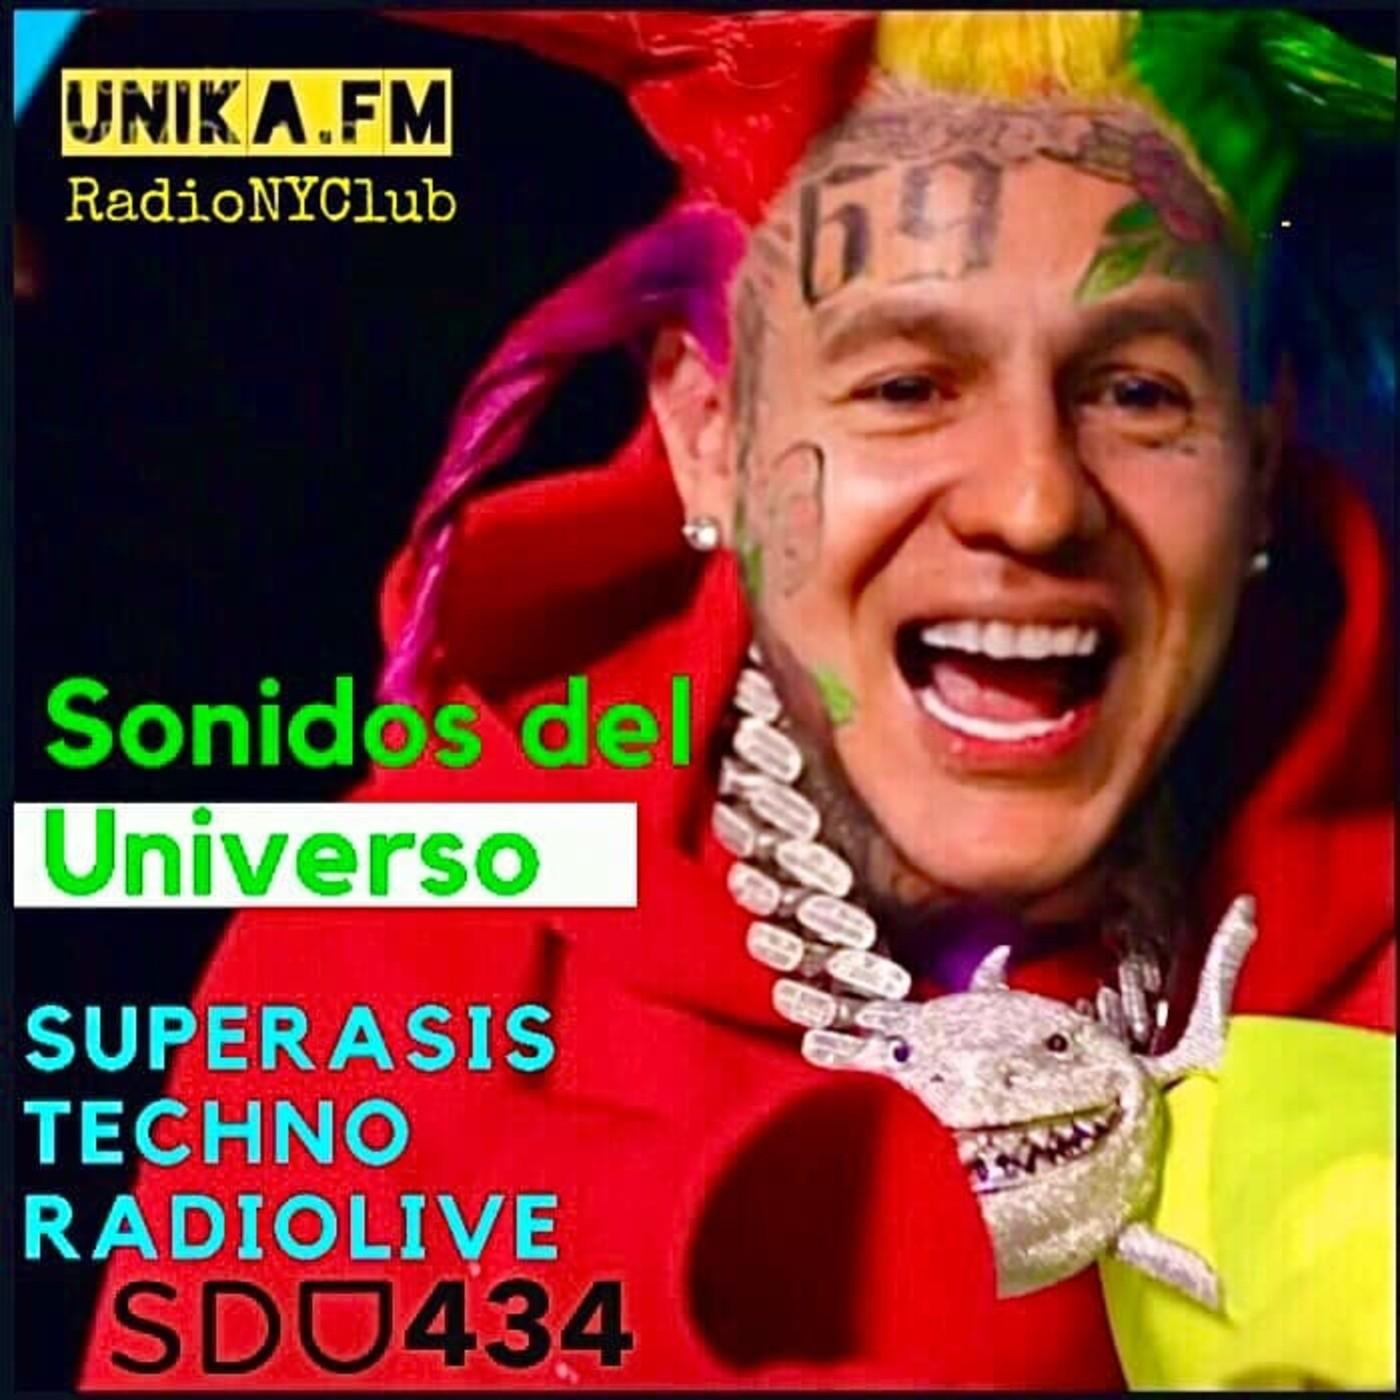 434.- SUPERASIS Presents: SONIDOS DEL UNIVERSO (SDU434) TECHNO RadioLive UNIKA.FM 22.09.20